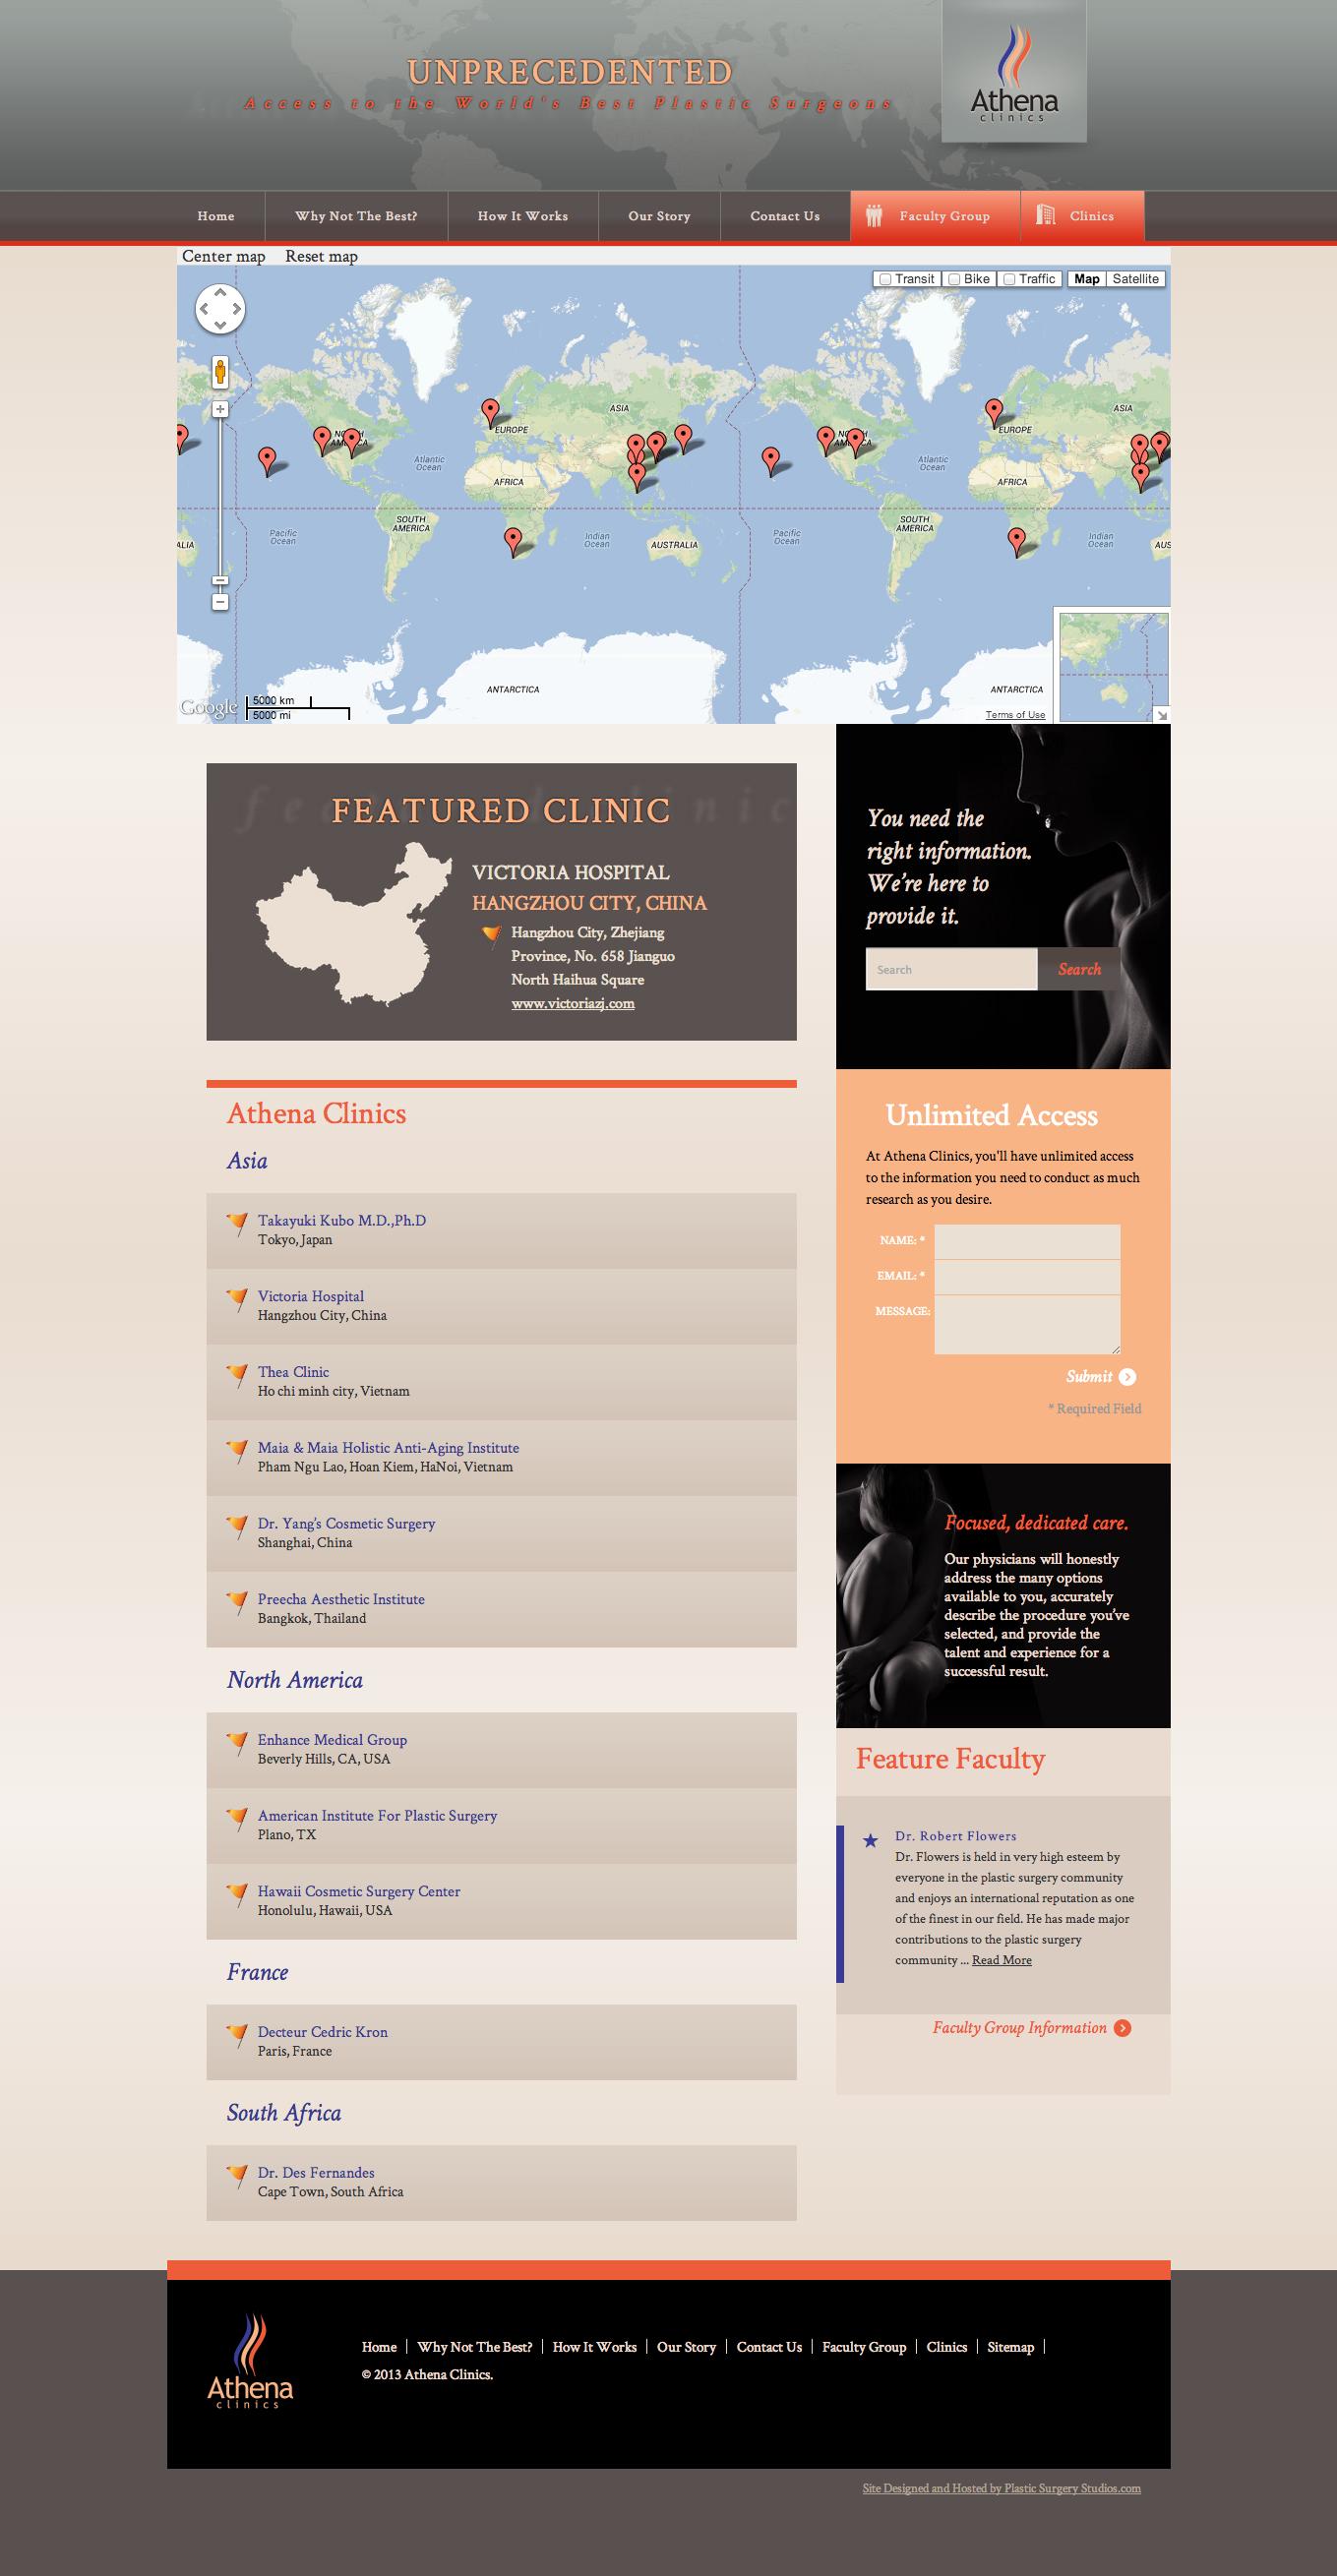 Athena Clinics- Map